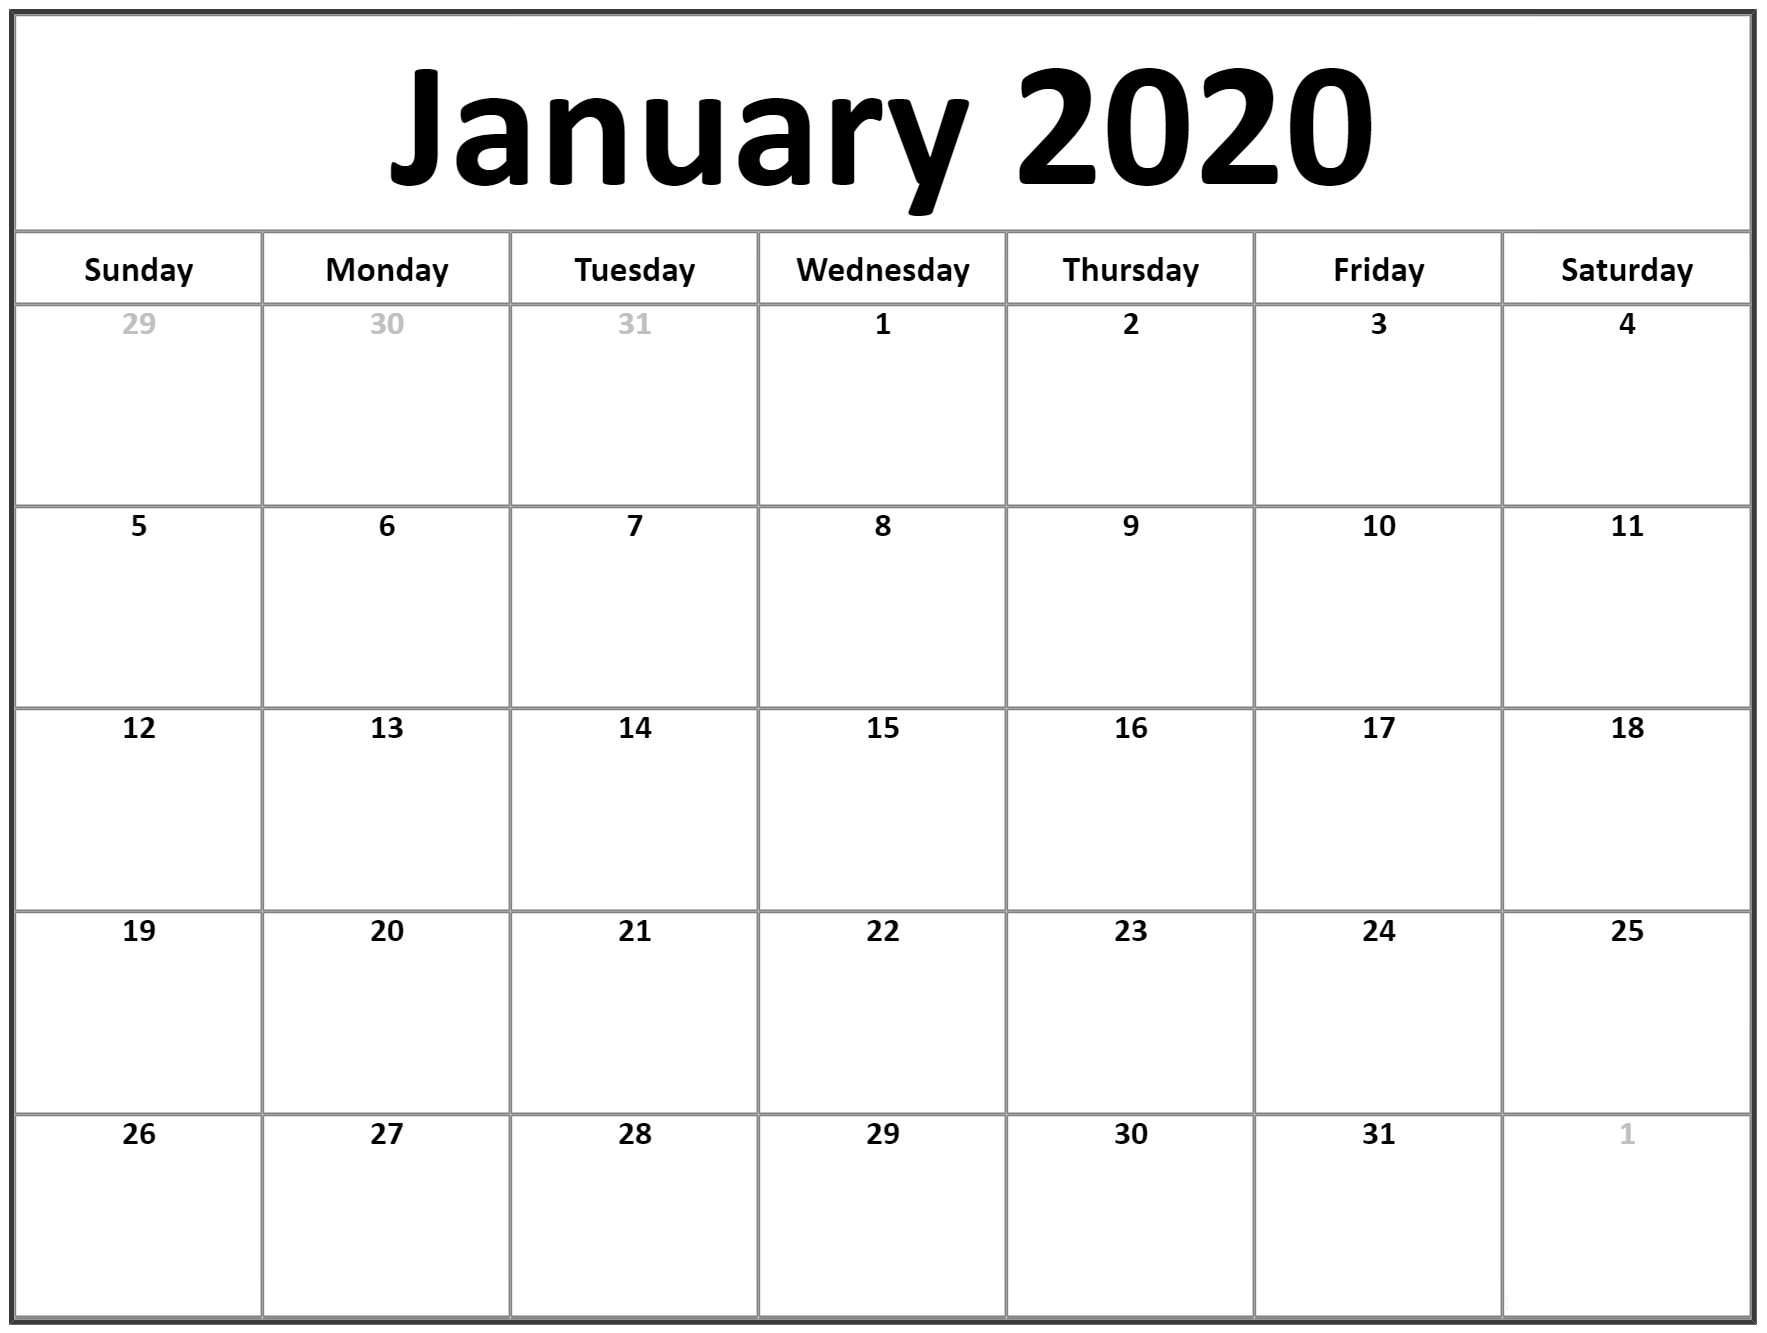 January 2020 Blank Calendar Printable Word Pdf Template throughout Blank January Calendar 2020